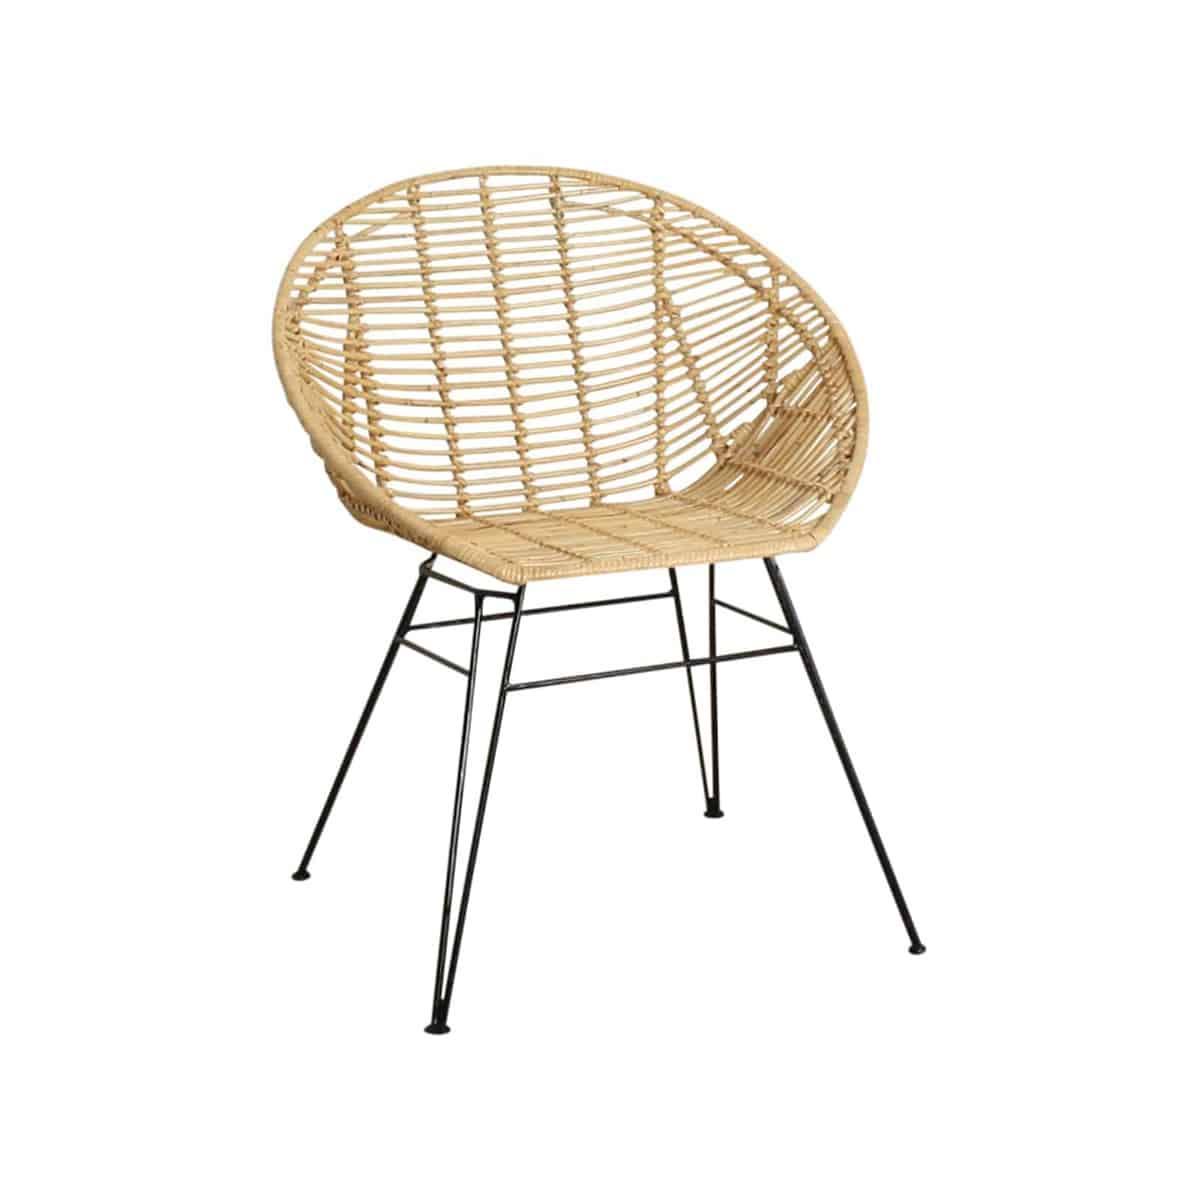 Jane bucket chair with metal legs